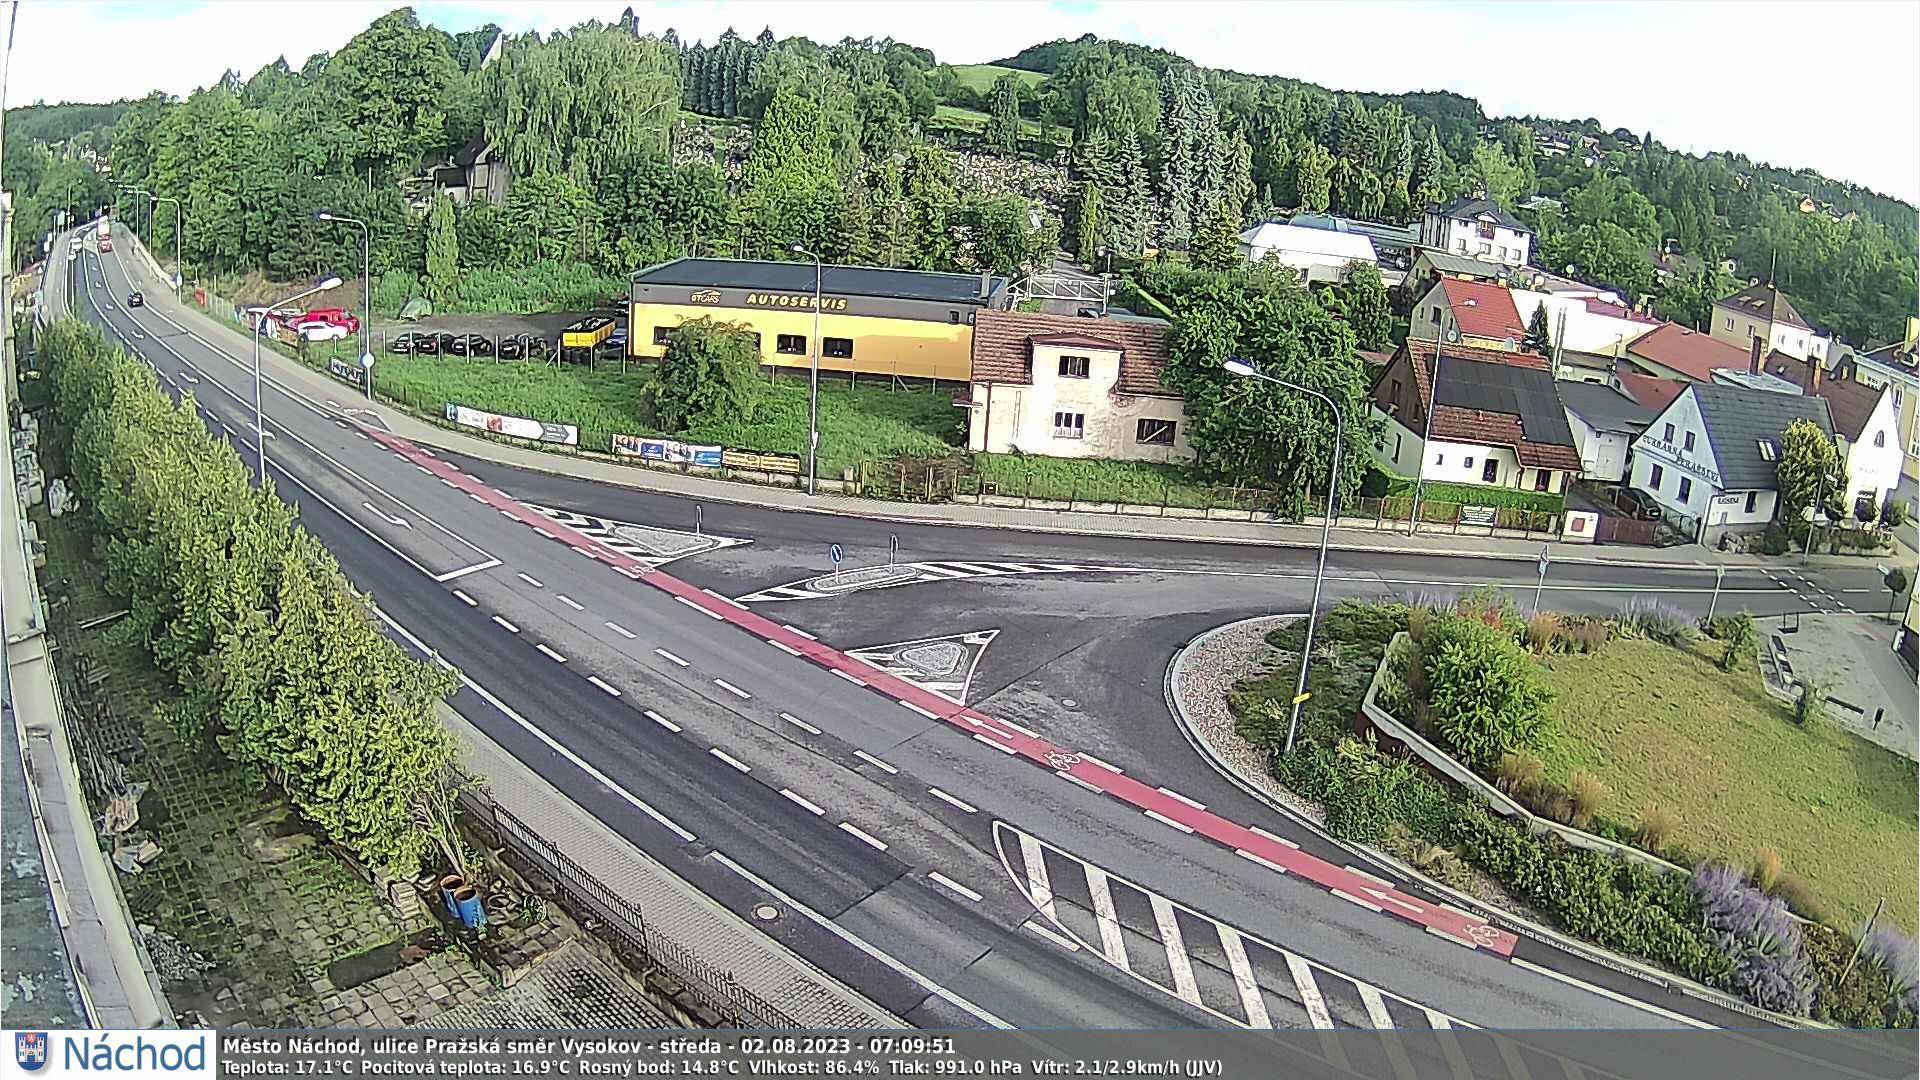 Webkamerka - Náchod, Bartoň směrem z centra